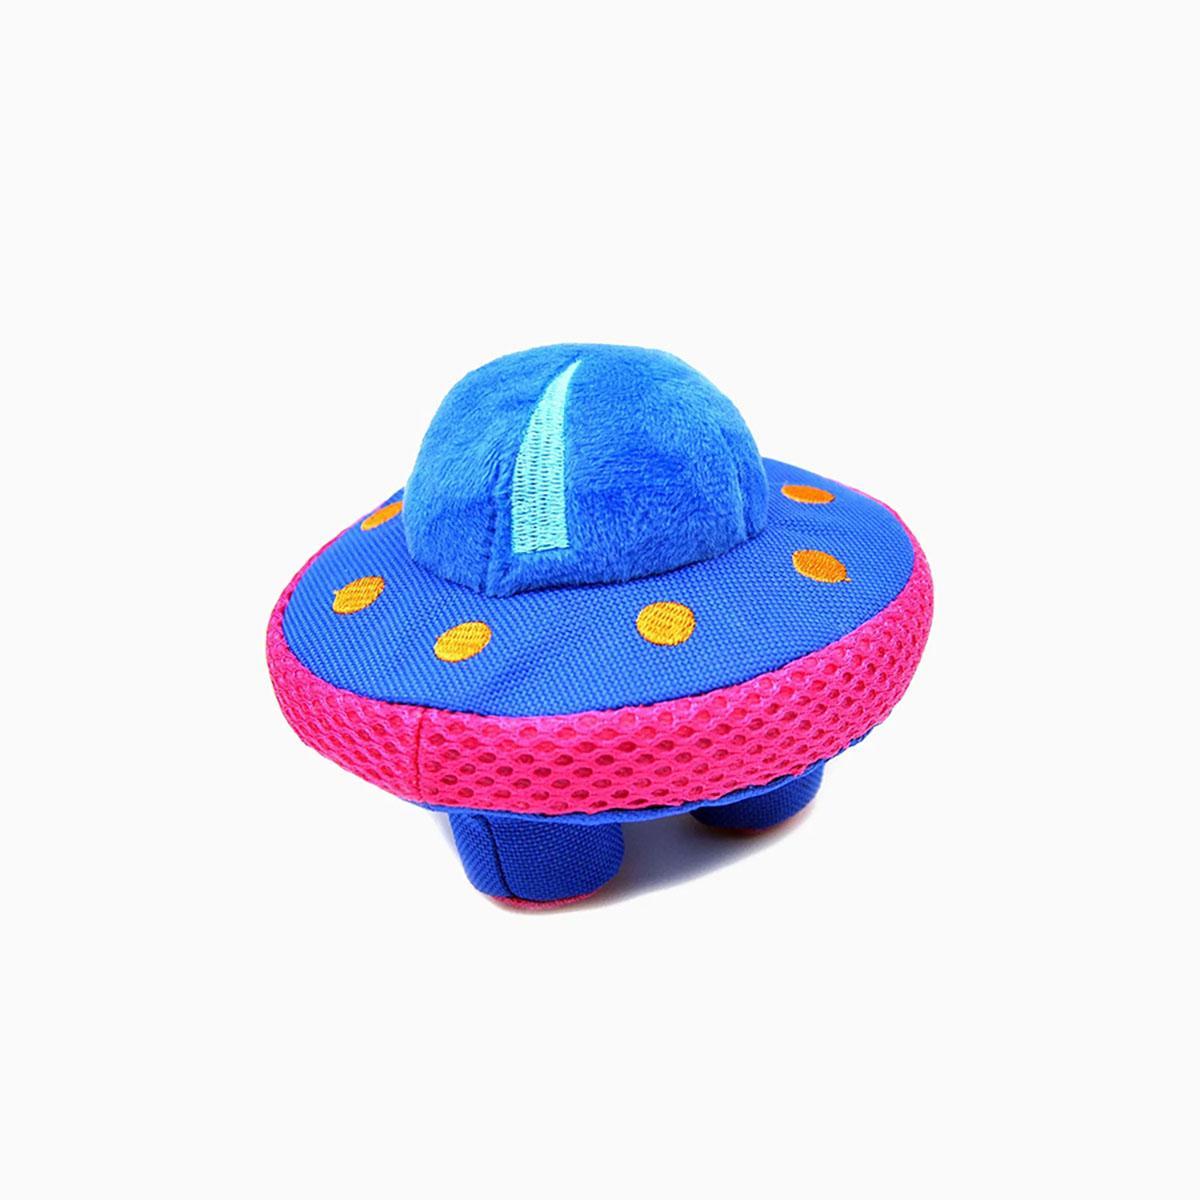 HugSmart Paw Invasion Dura Guard Dog Toy - UFO